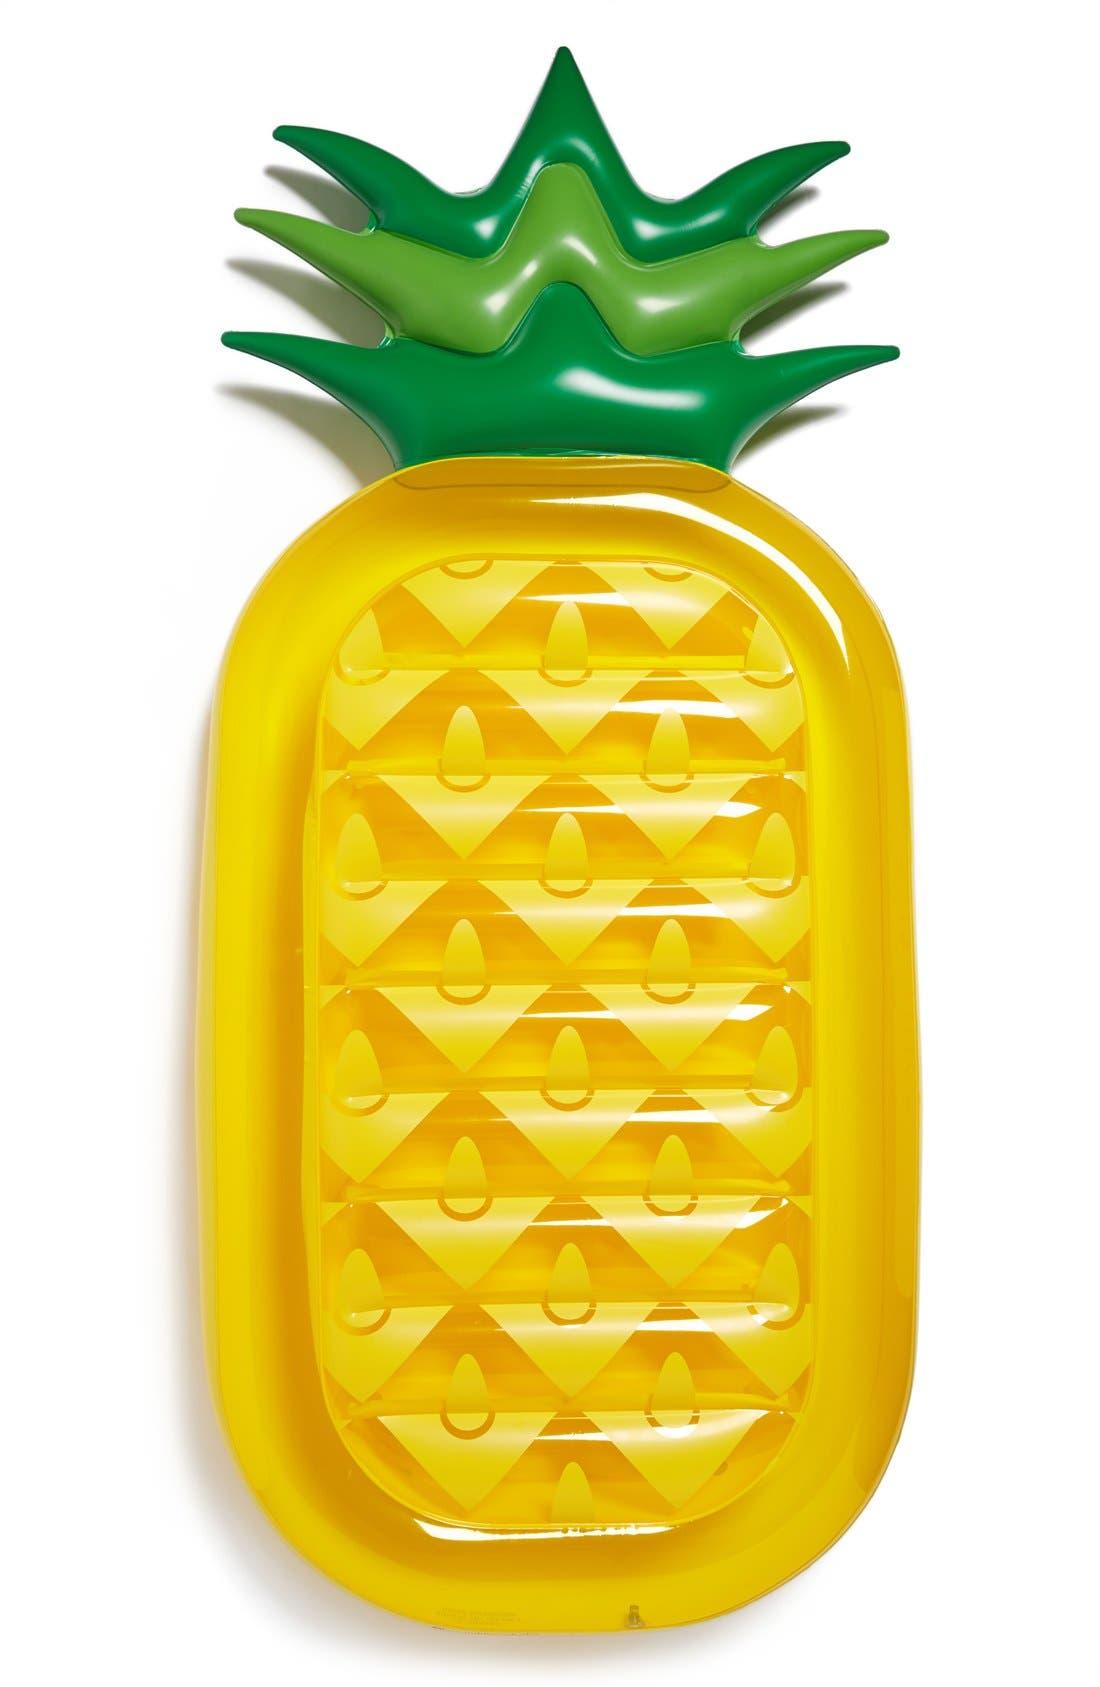 Main Image - Sunnylife 'Really Big' Inflatable Pineapple Pool Floatie